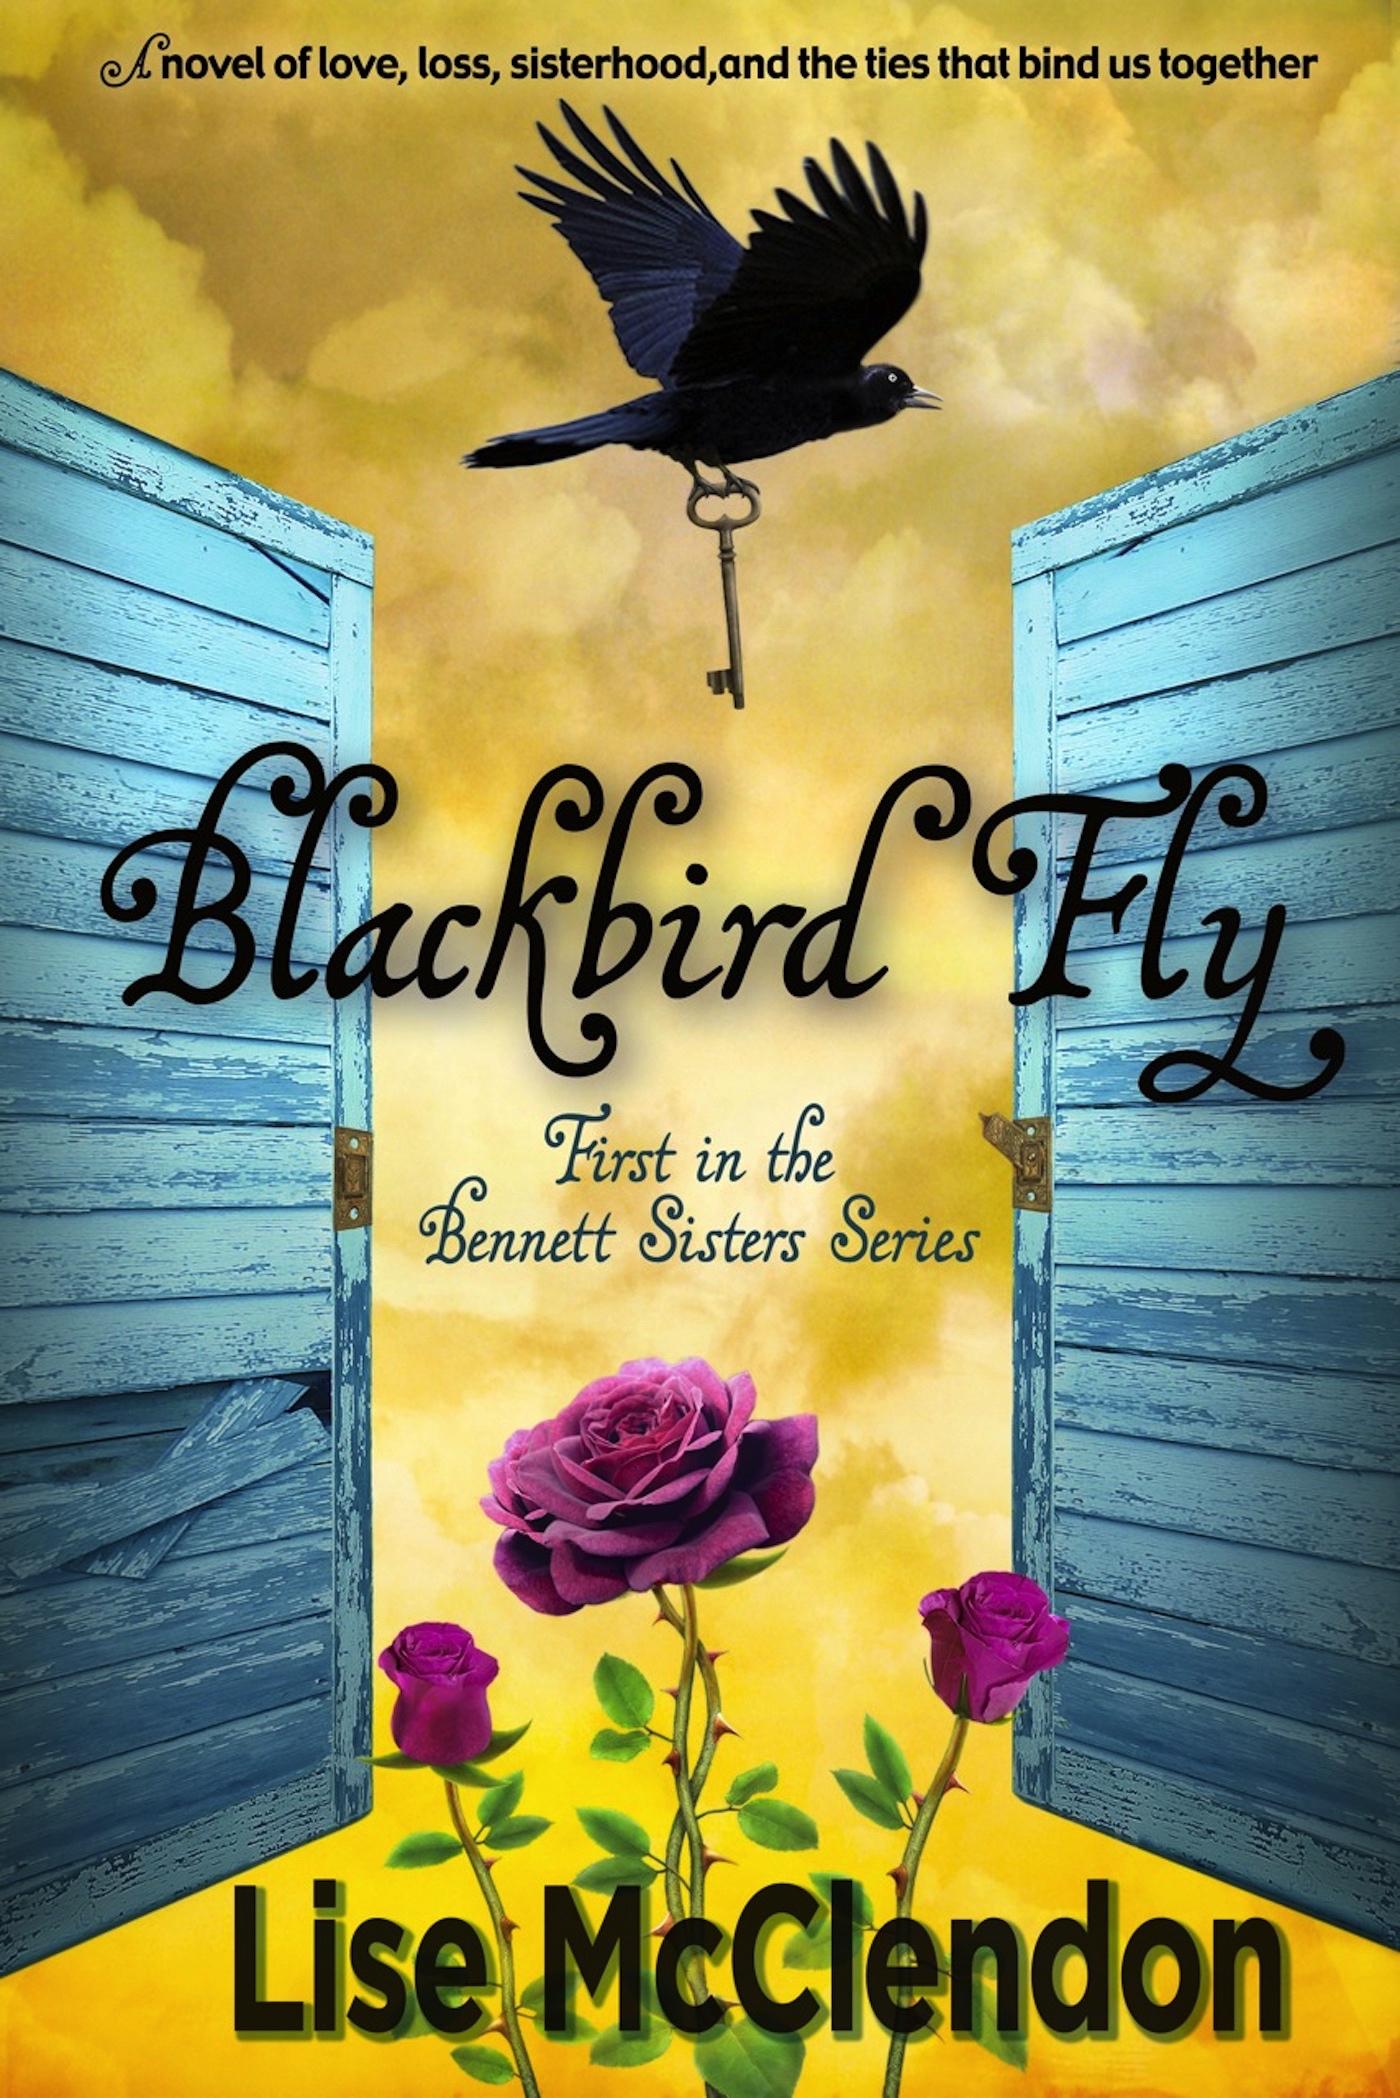 Blackbird-Fly-Kindle